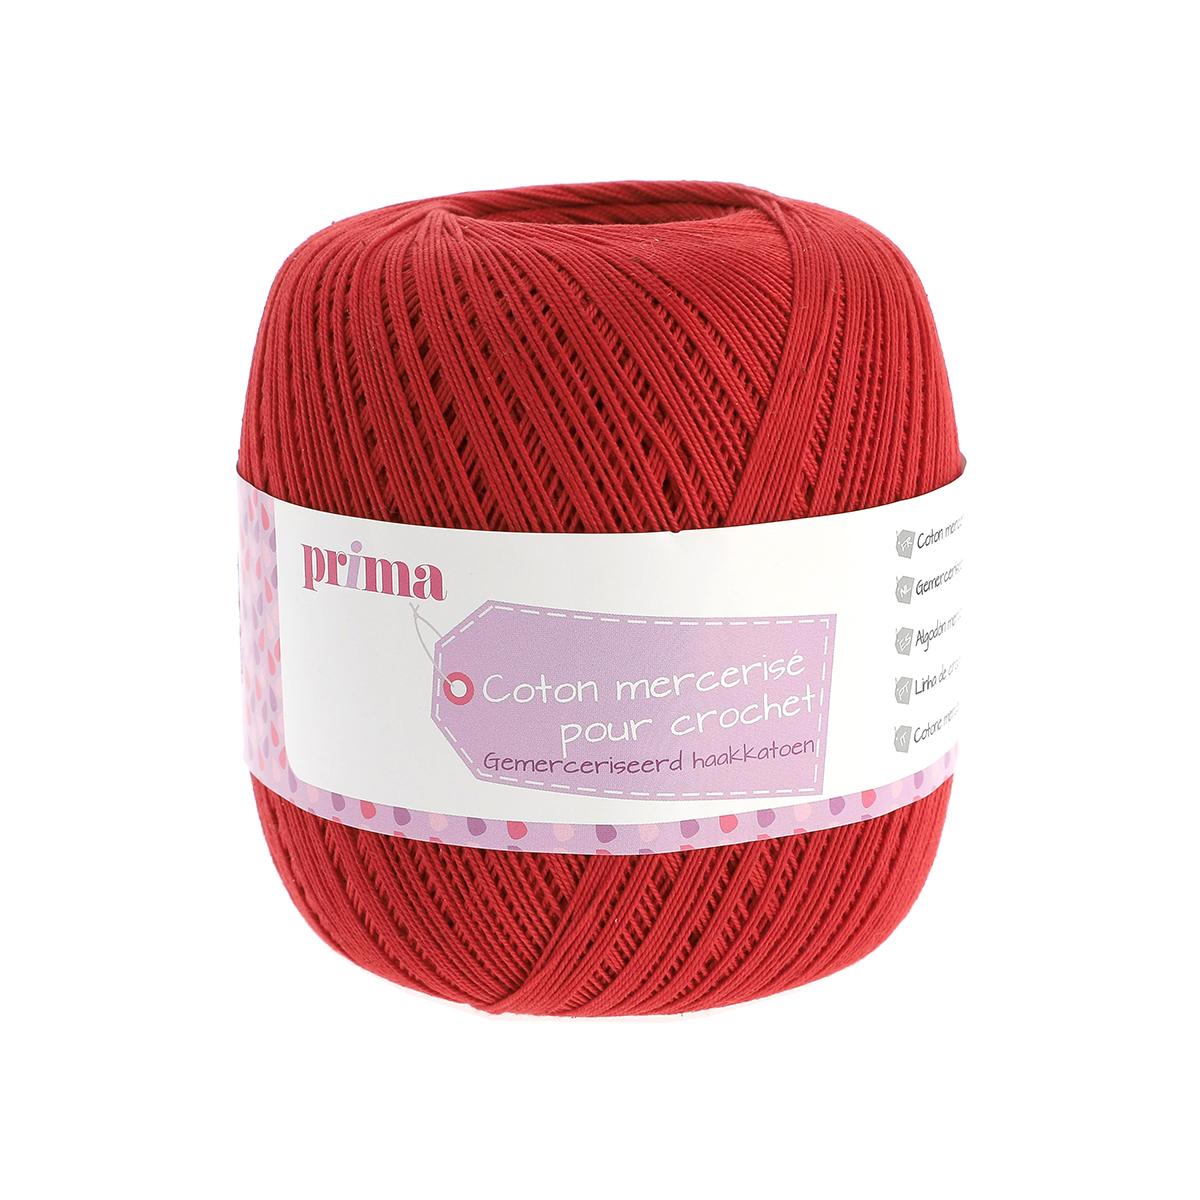 Coton à crocheter rouge - Prima Mercerie